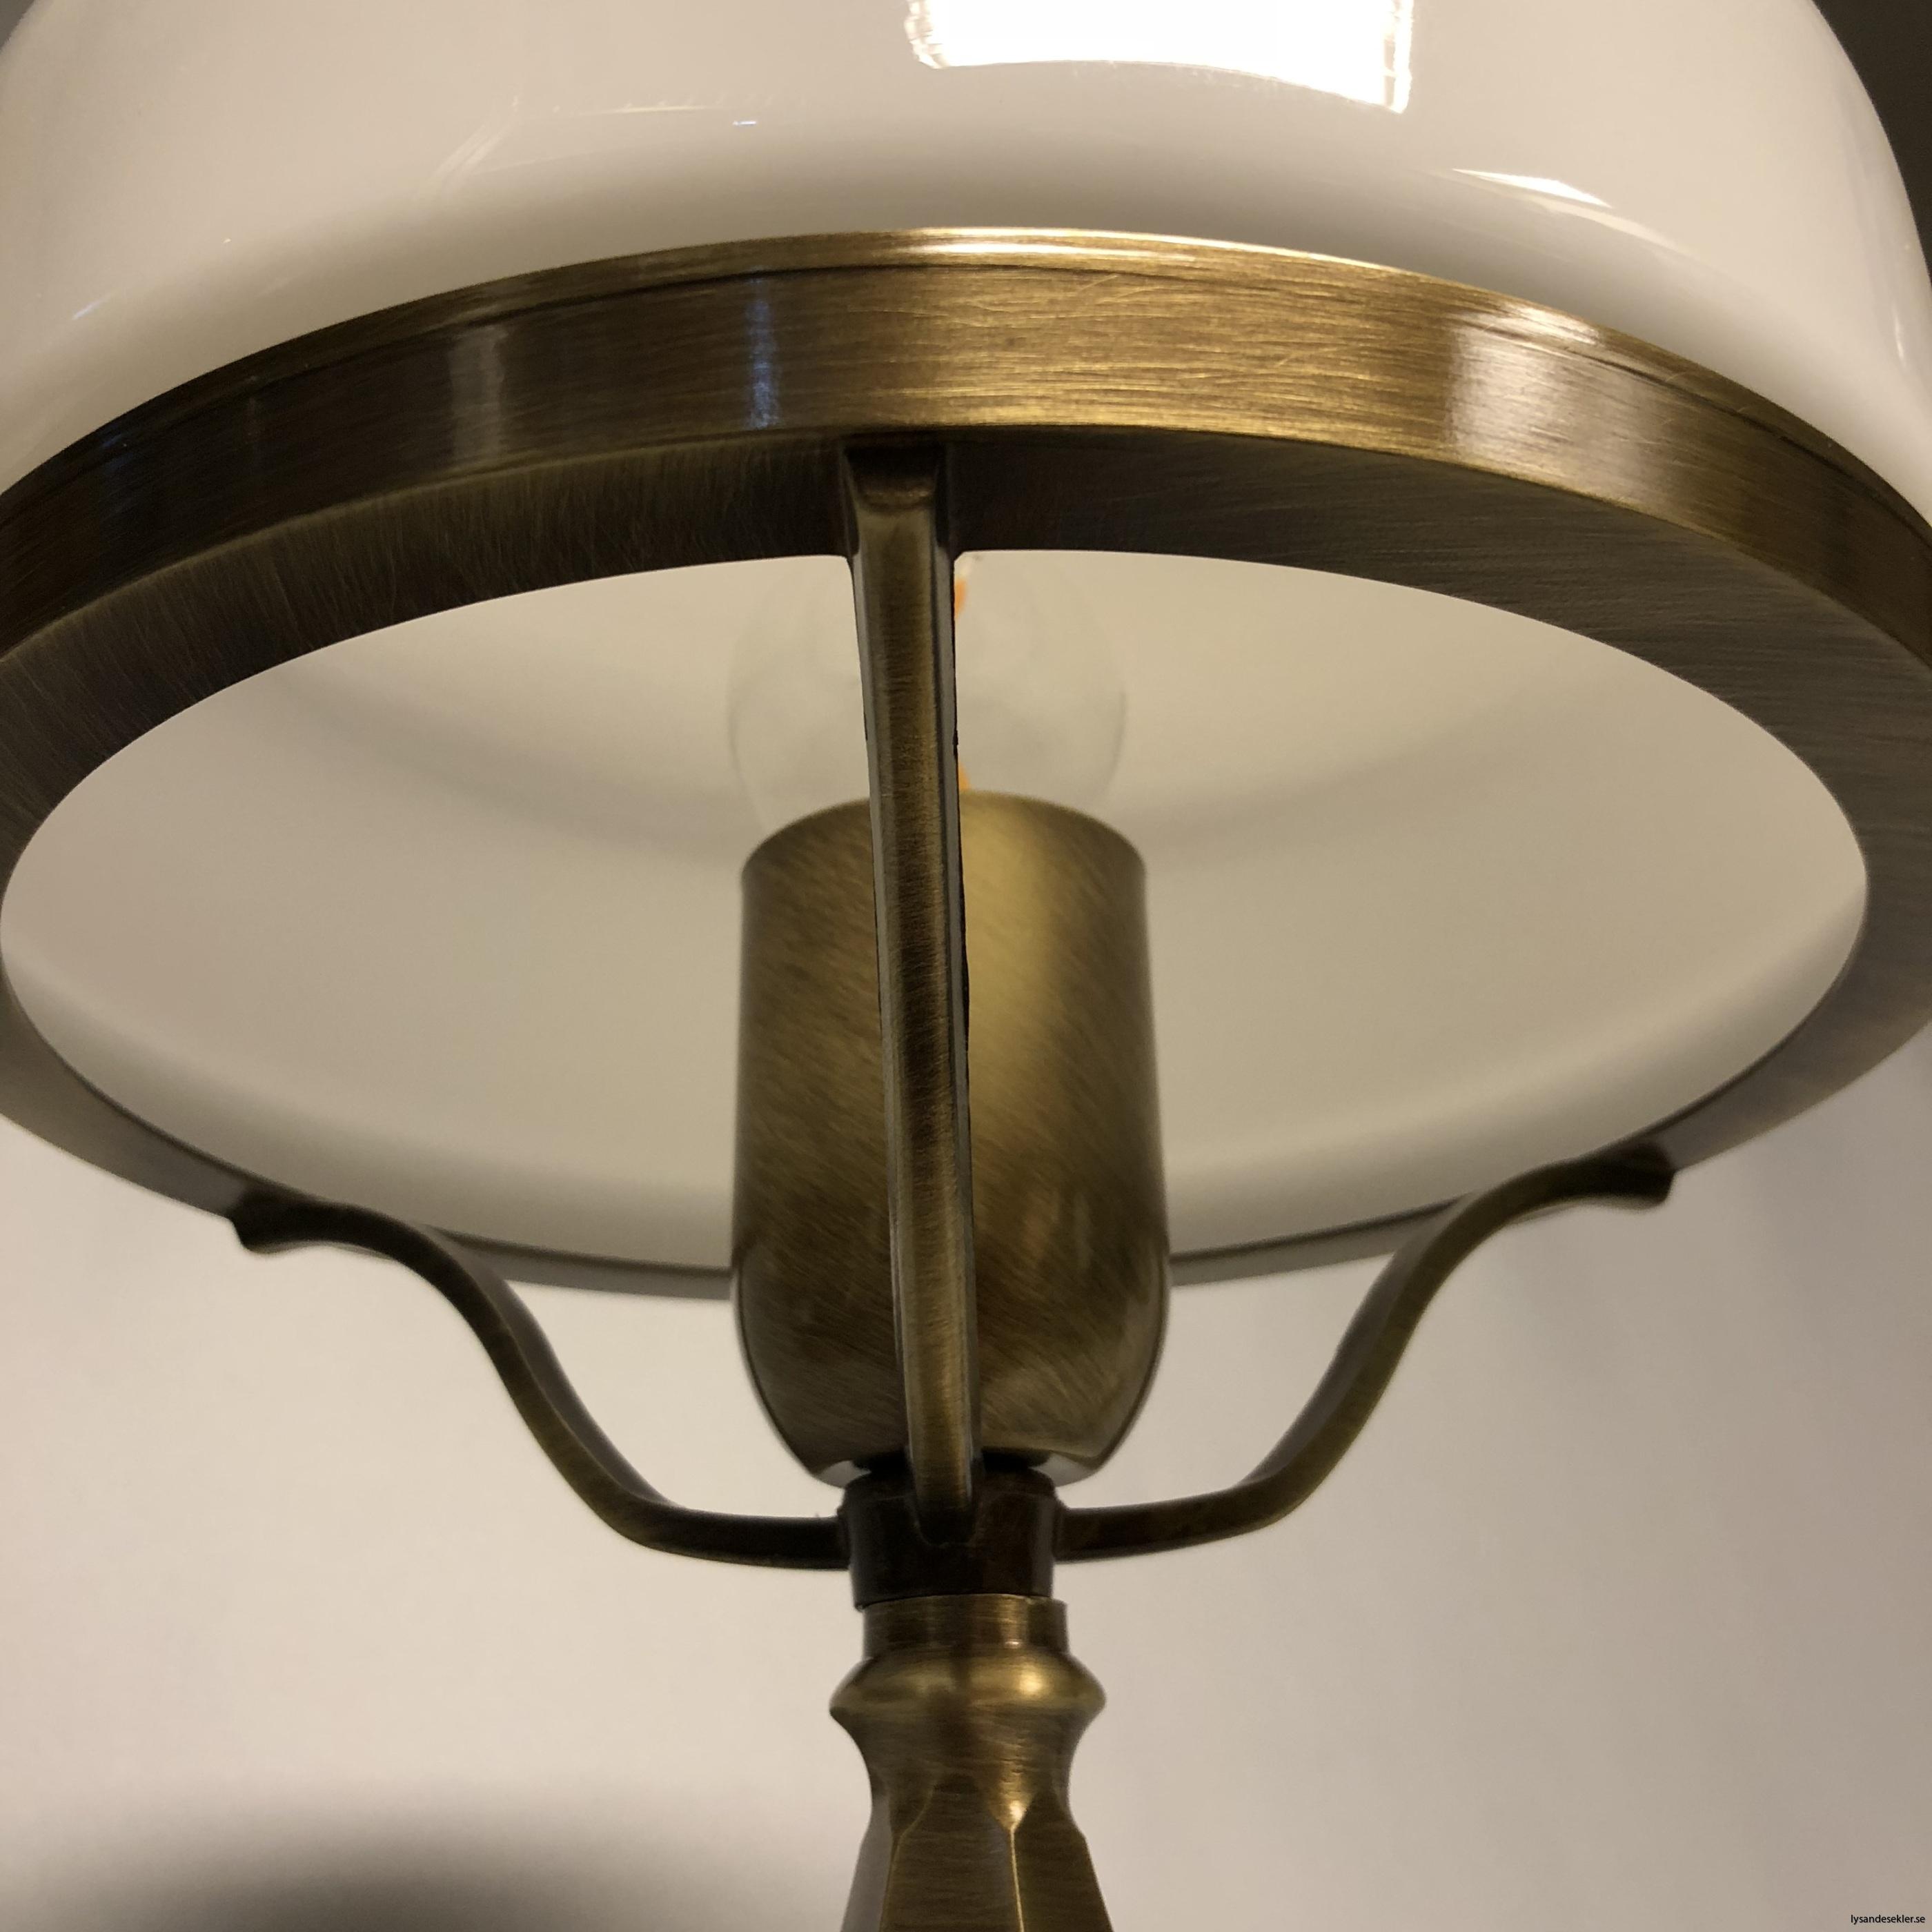 strindbergslampa strindbergslampor strindberg lampa skärm kupa strindbergsskärm strindbergskupa8